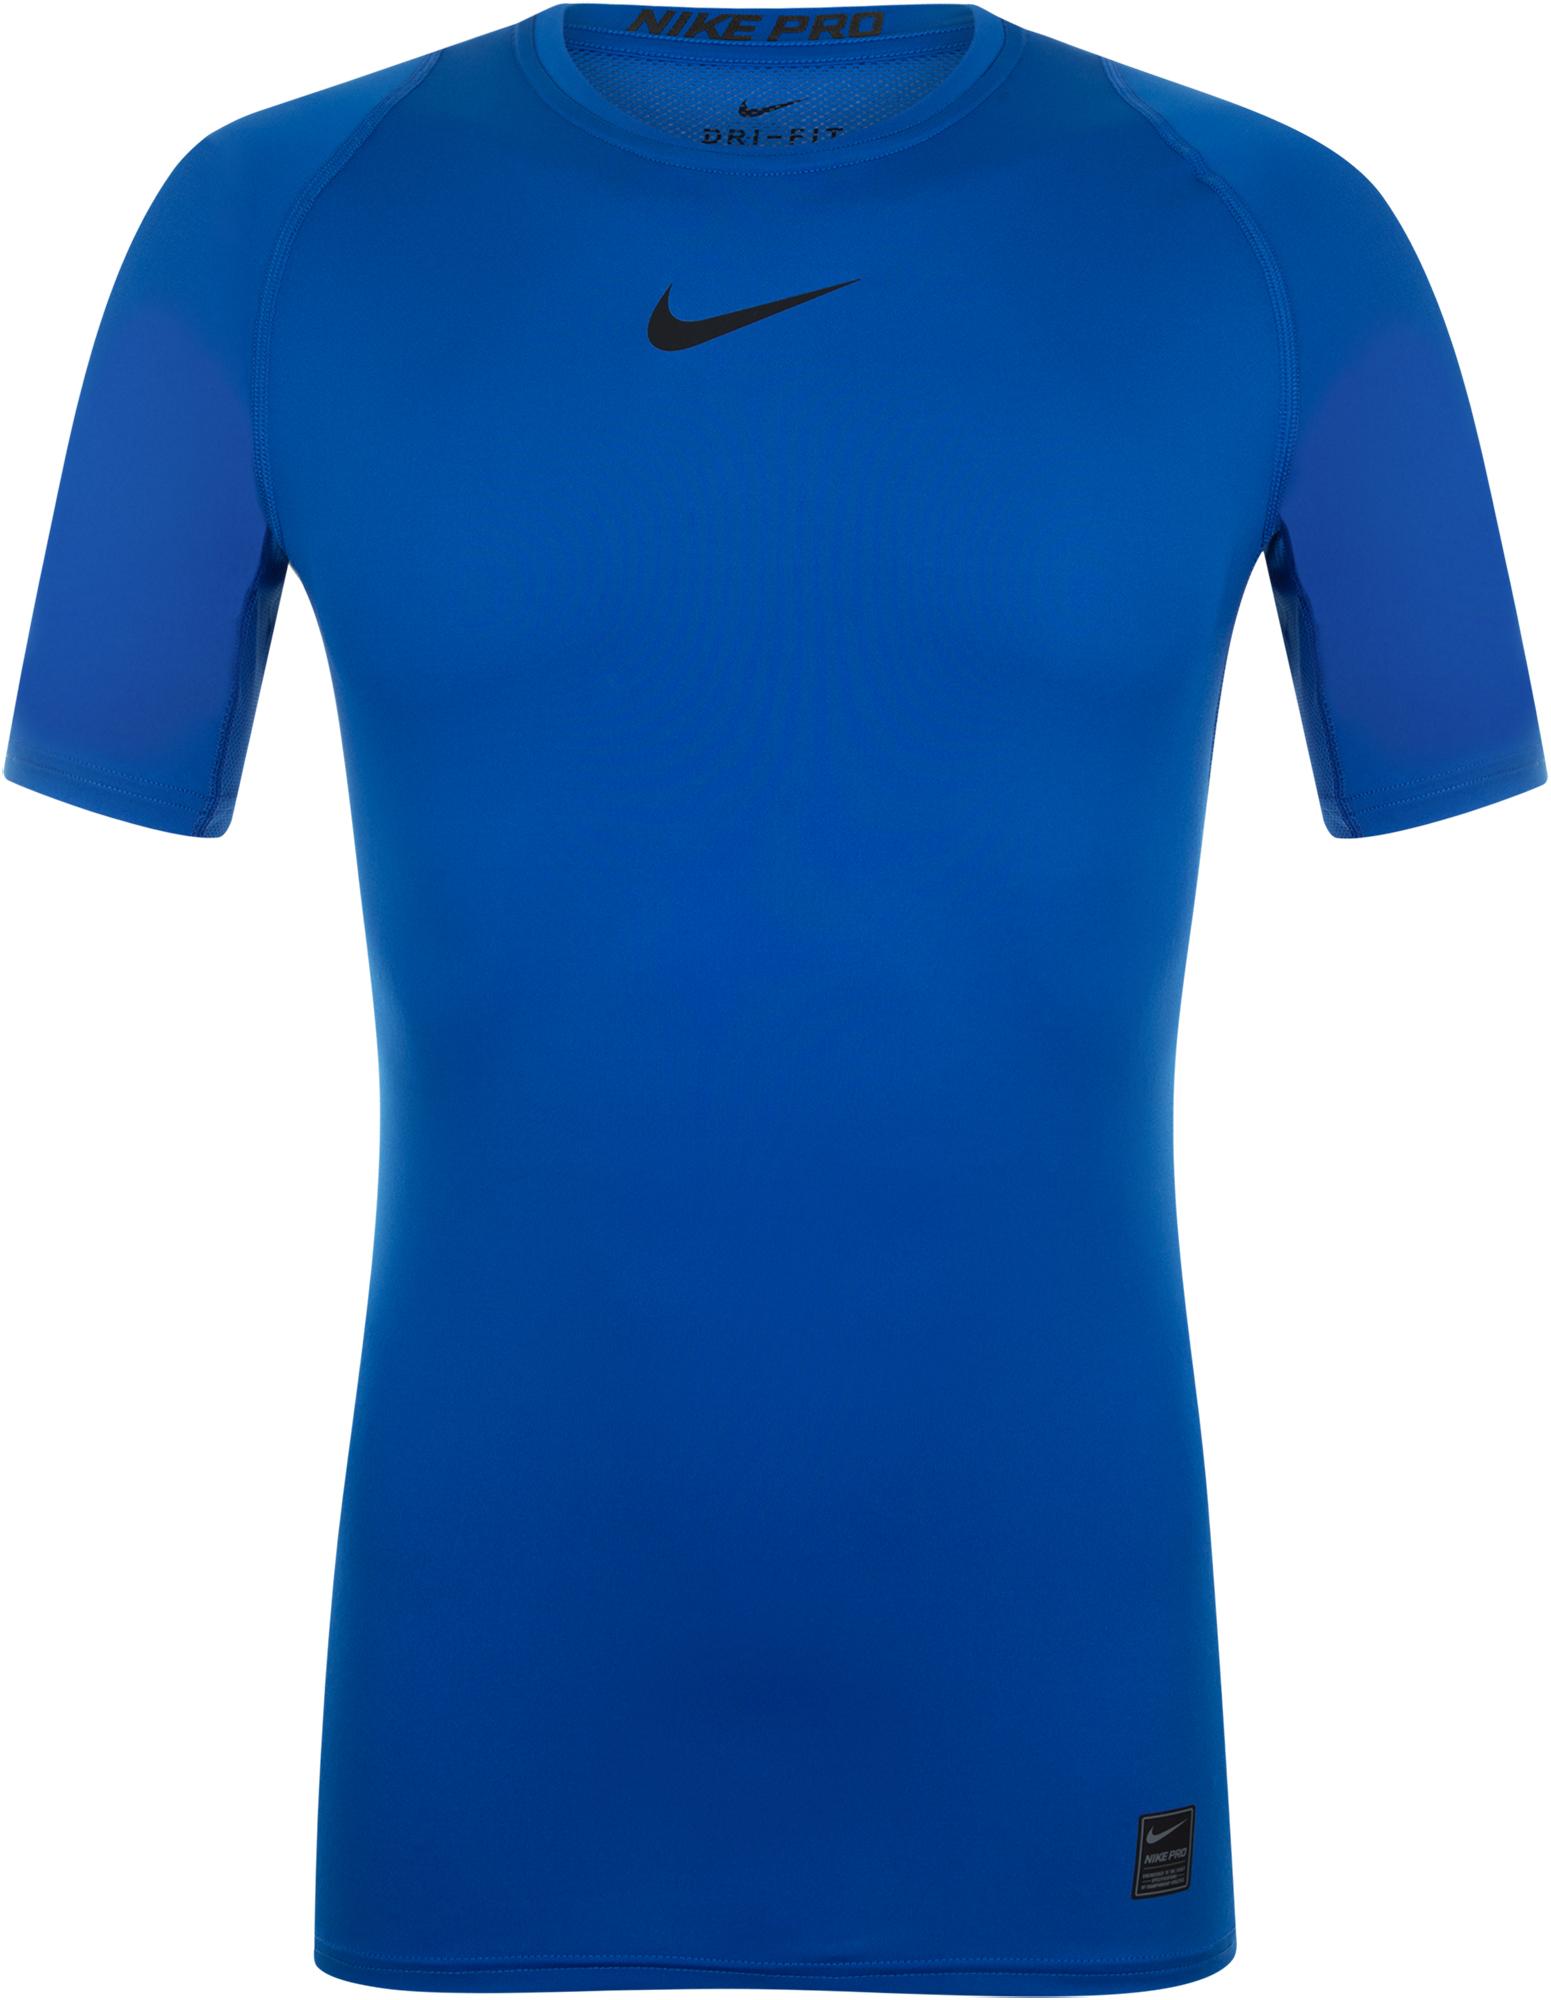 Nike Футболка мужская Nike Pro, размер 46-48 nike футболка мужская nike cool miler